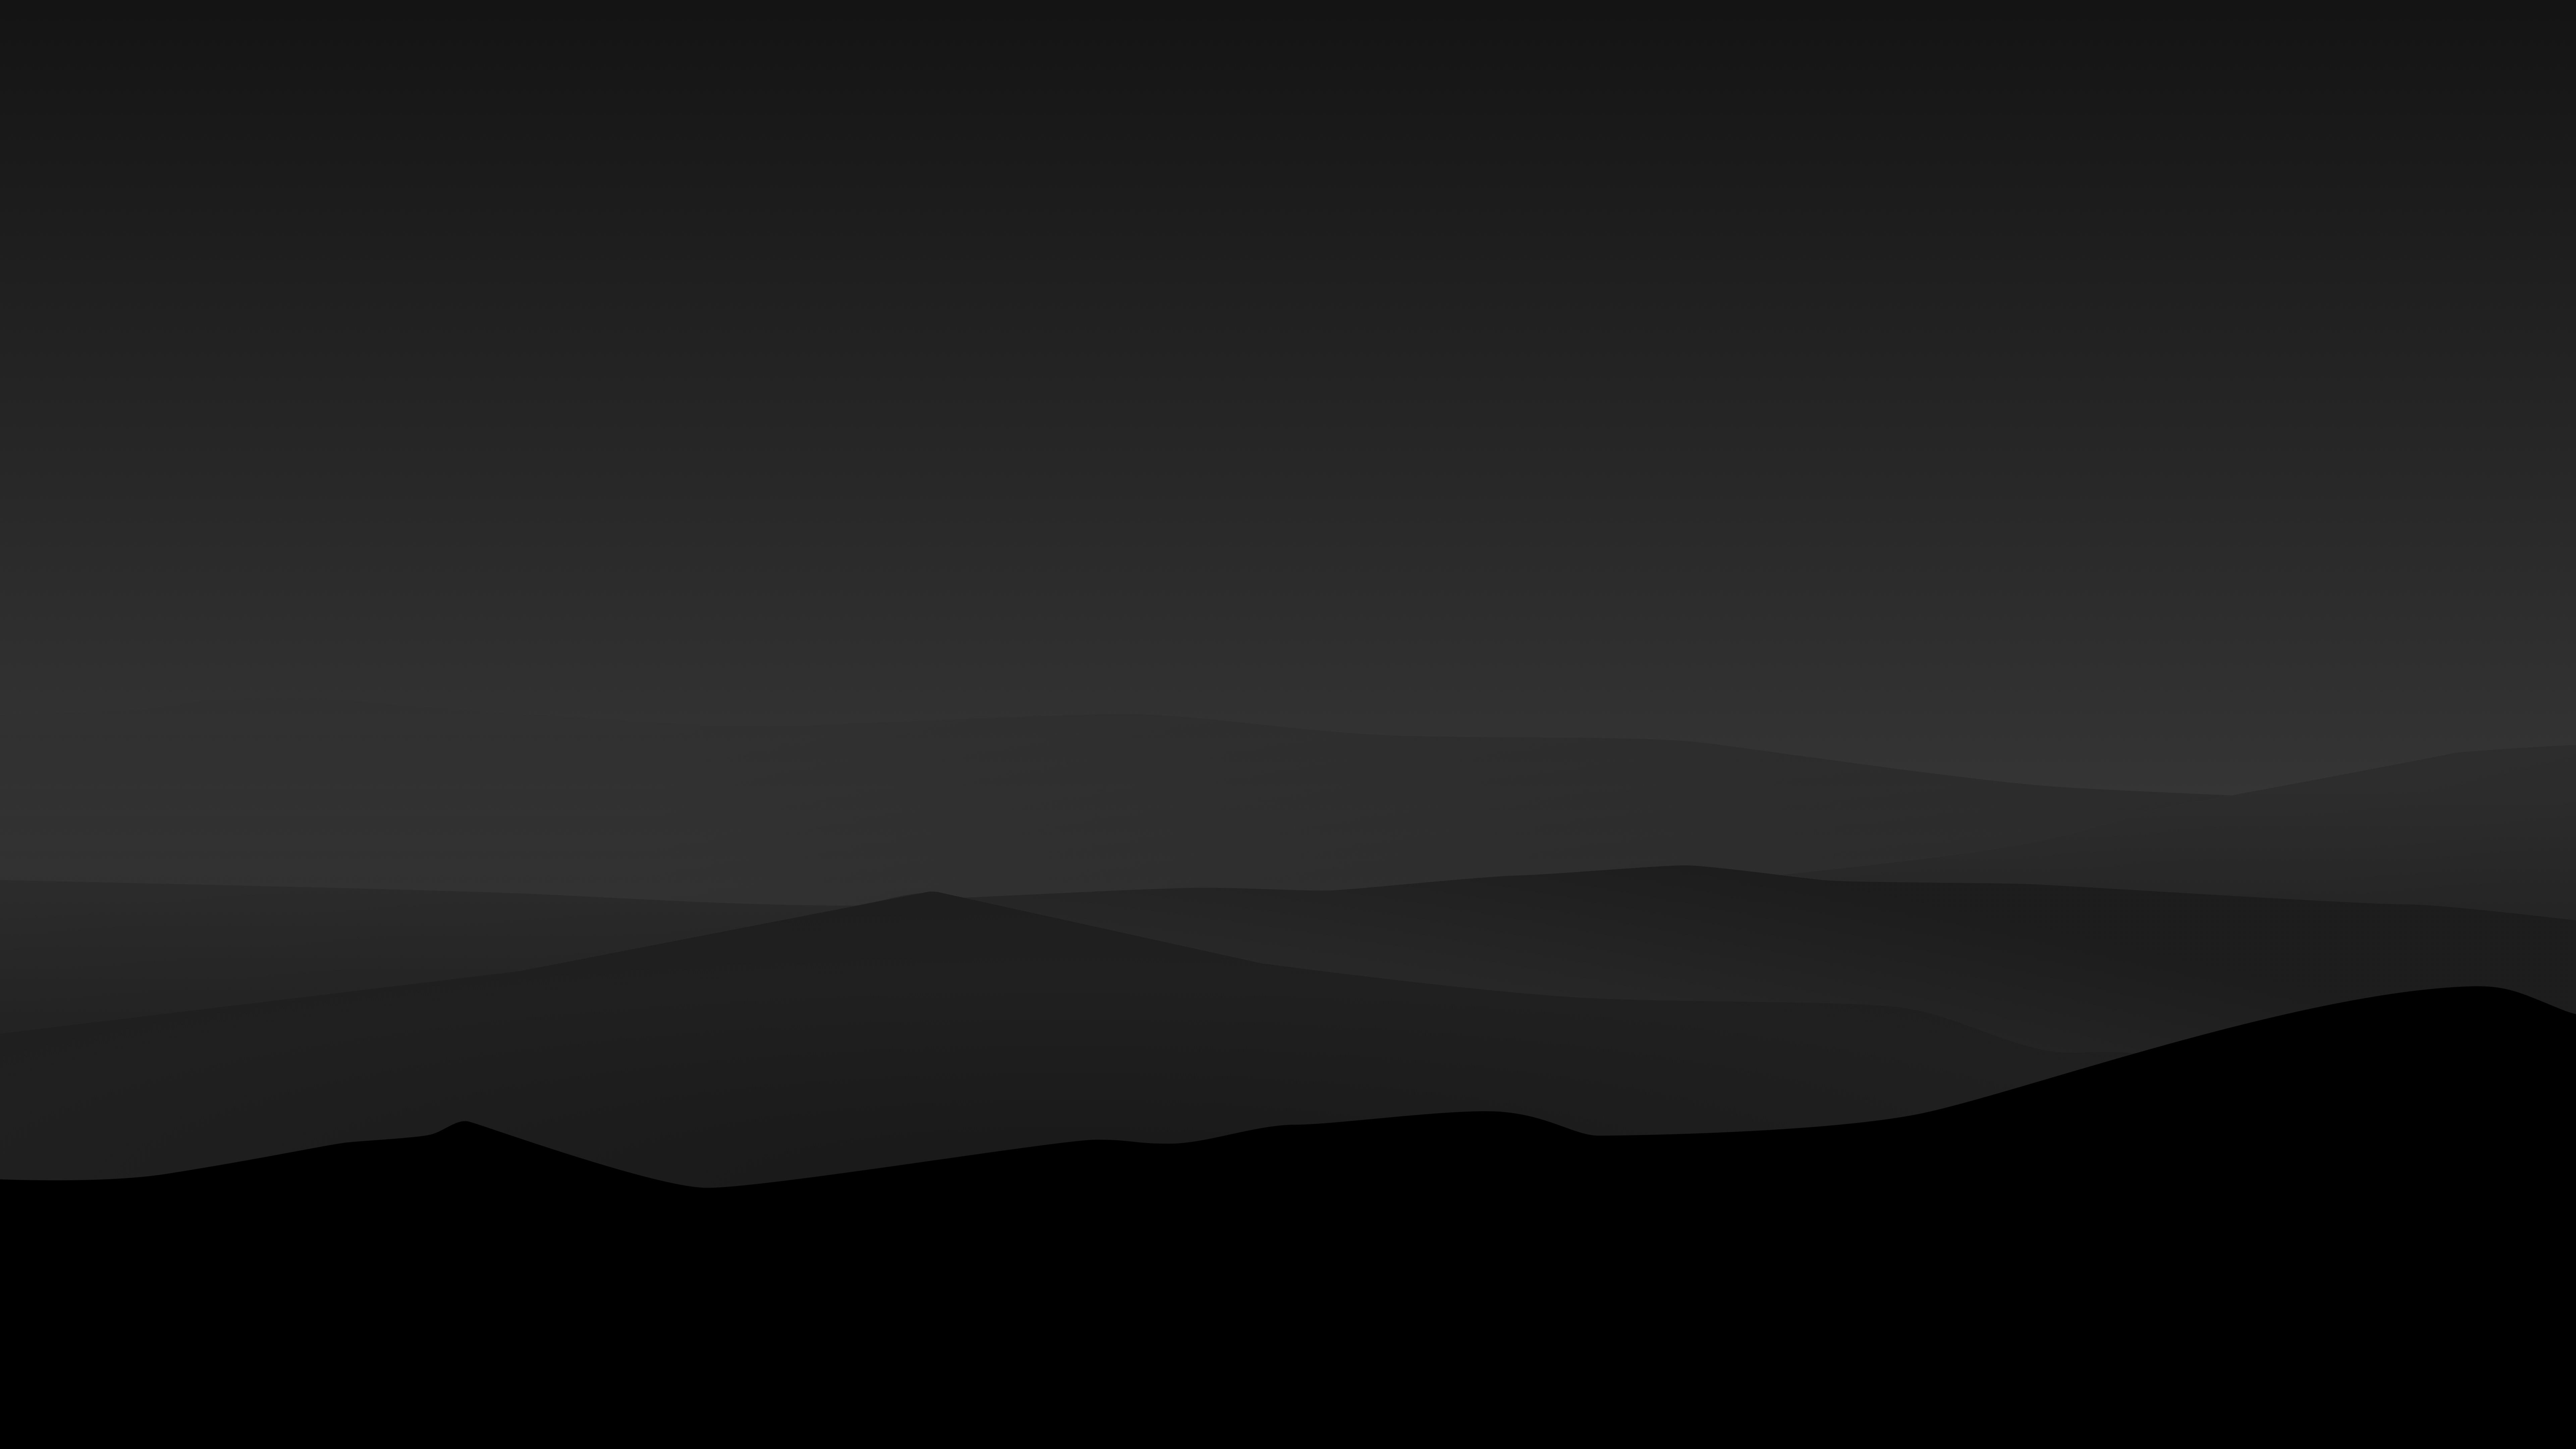 Dark Night Mountains Minimalist 4k, HD Artist, 4k ...